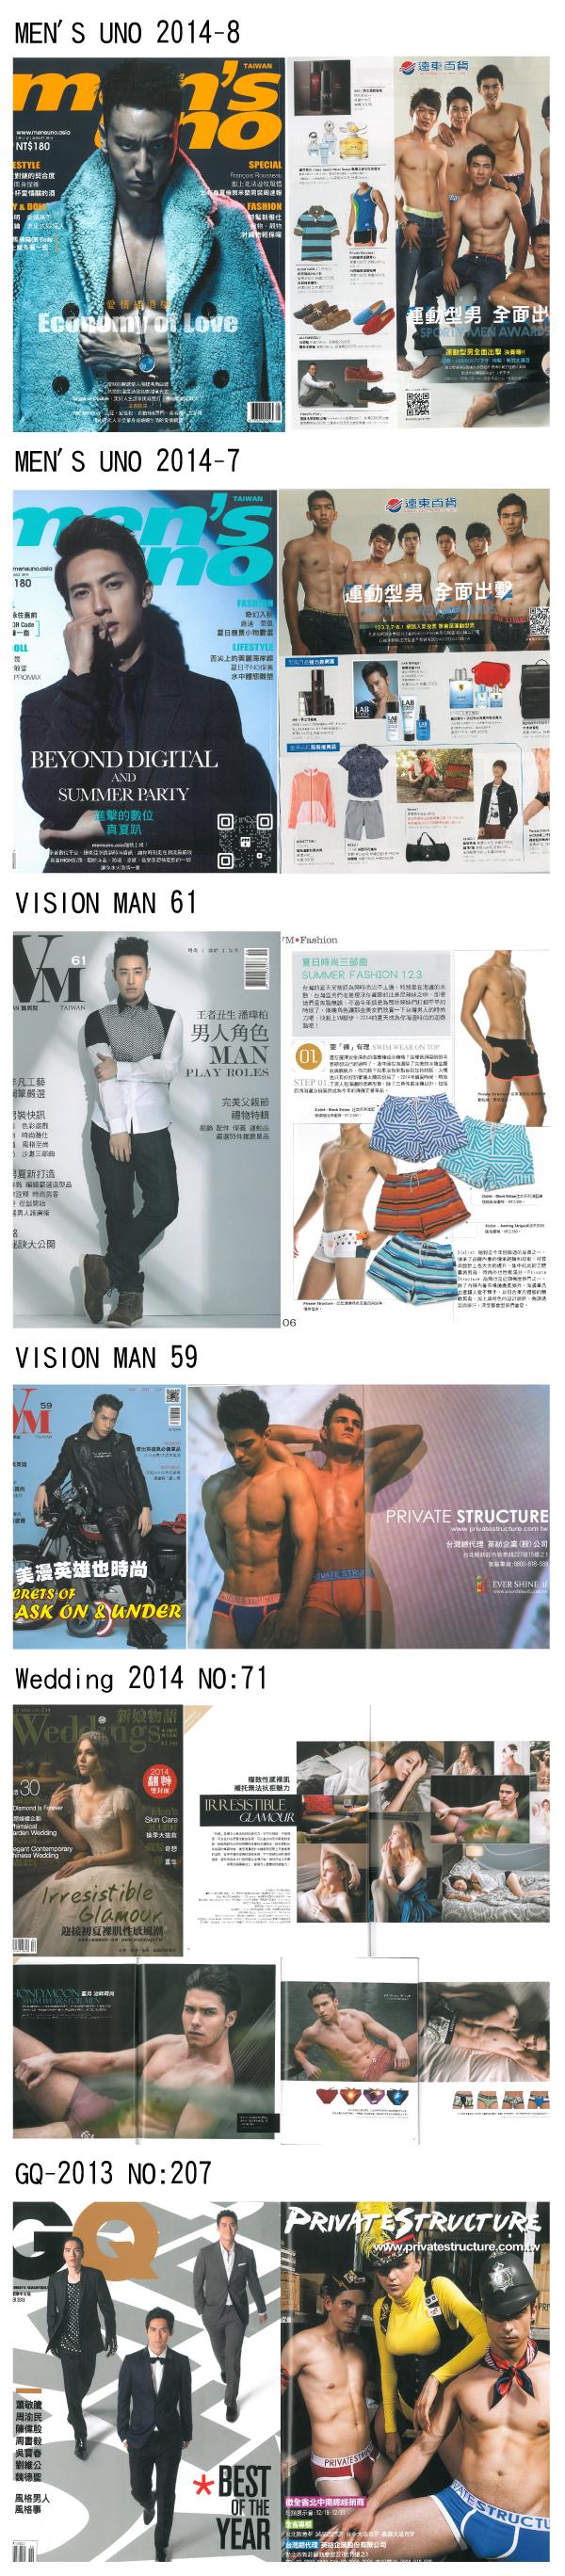 http://www.momoshop.com.tw/expertimg/0003/737/821/ps-magazine.jpg?t=1448902169